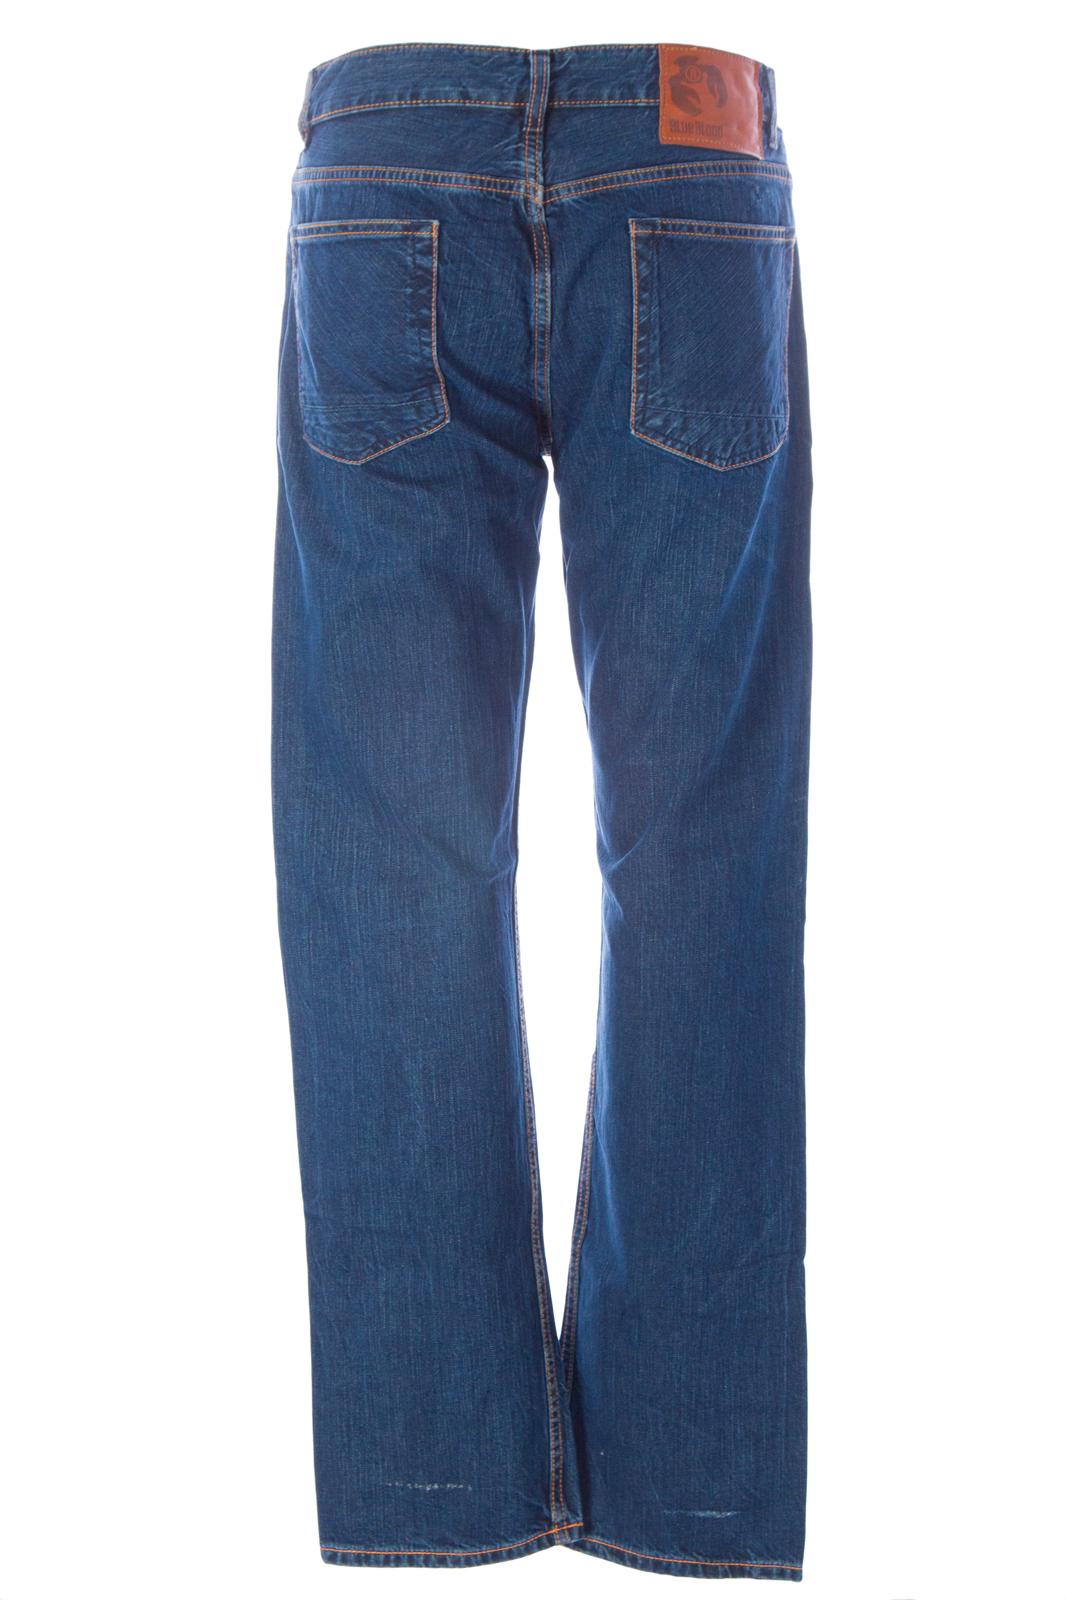 BLUE BLOOD Men/'s Target MIJ4 Cinch Back Denim Jeans MS08D07 $250 NWT